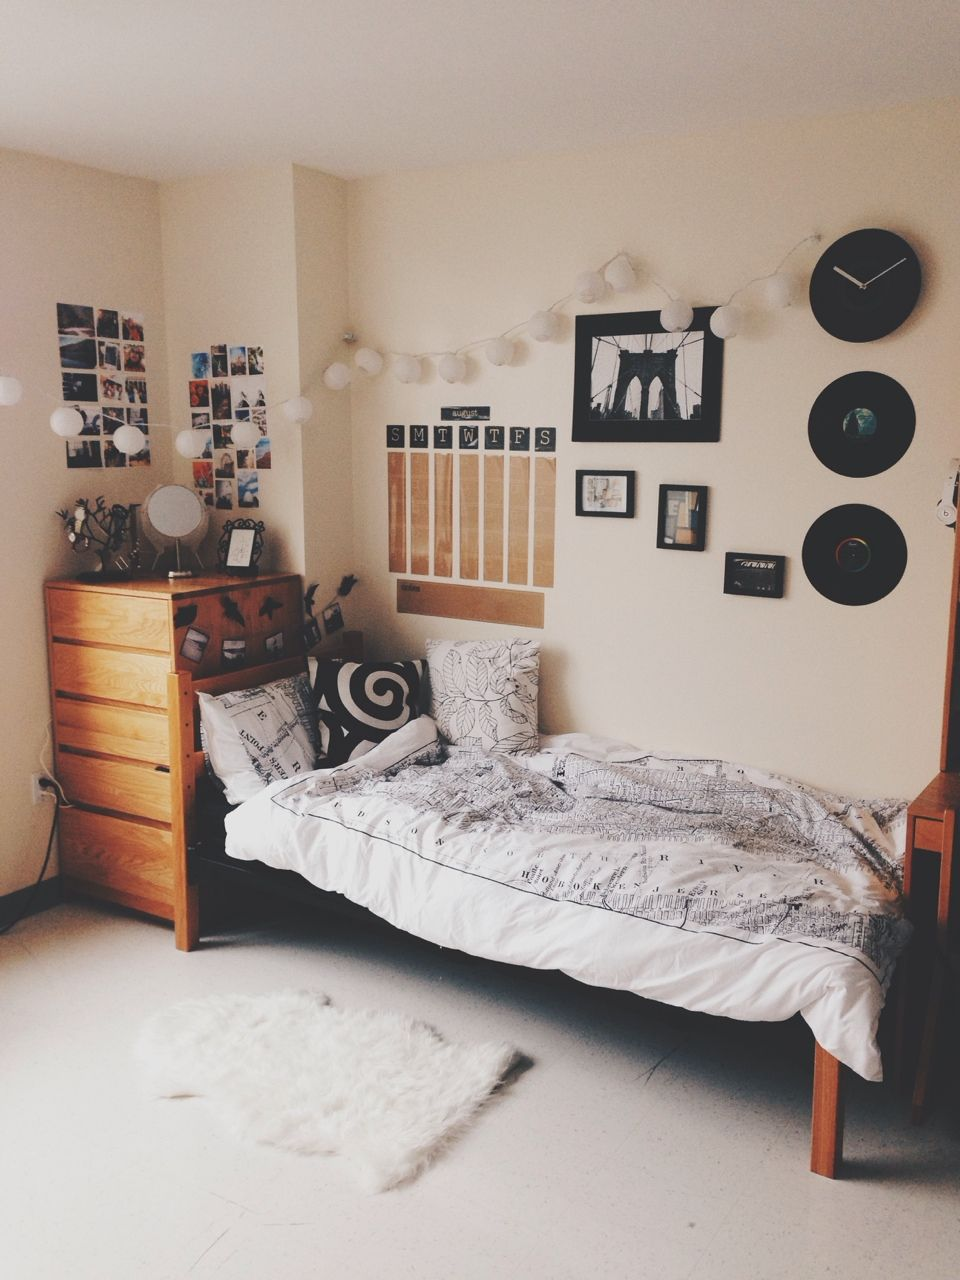 pinceline martens on room ideas | pinterest | freshman, dorm